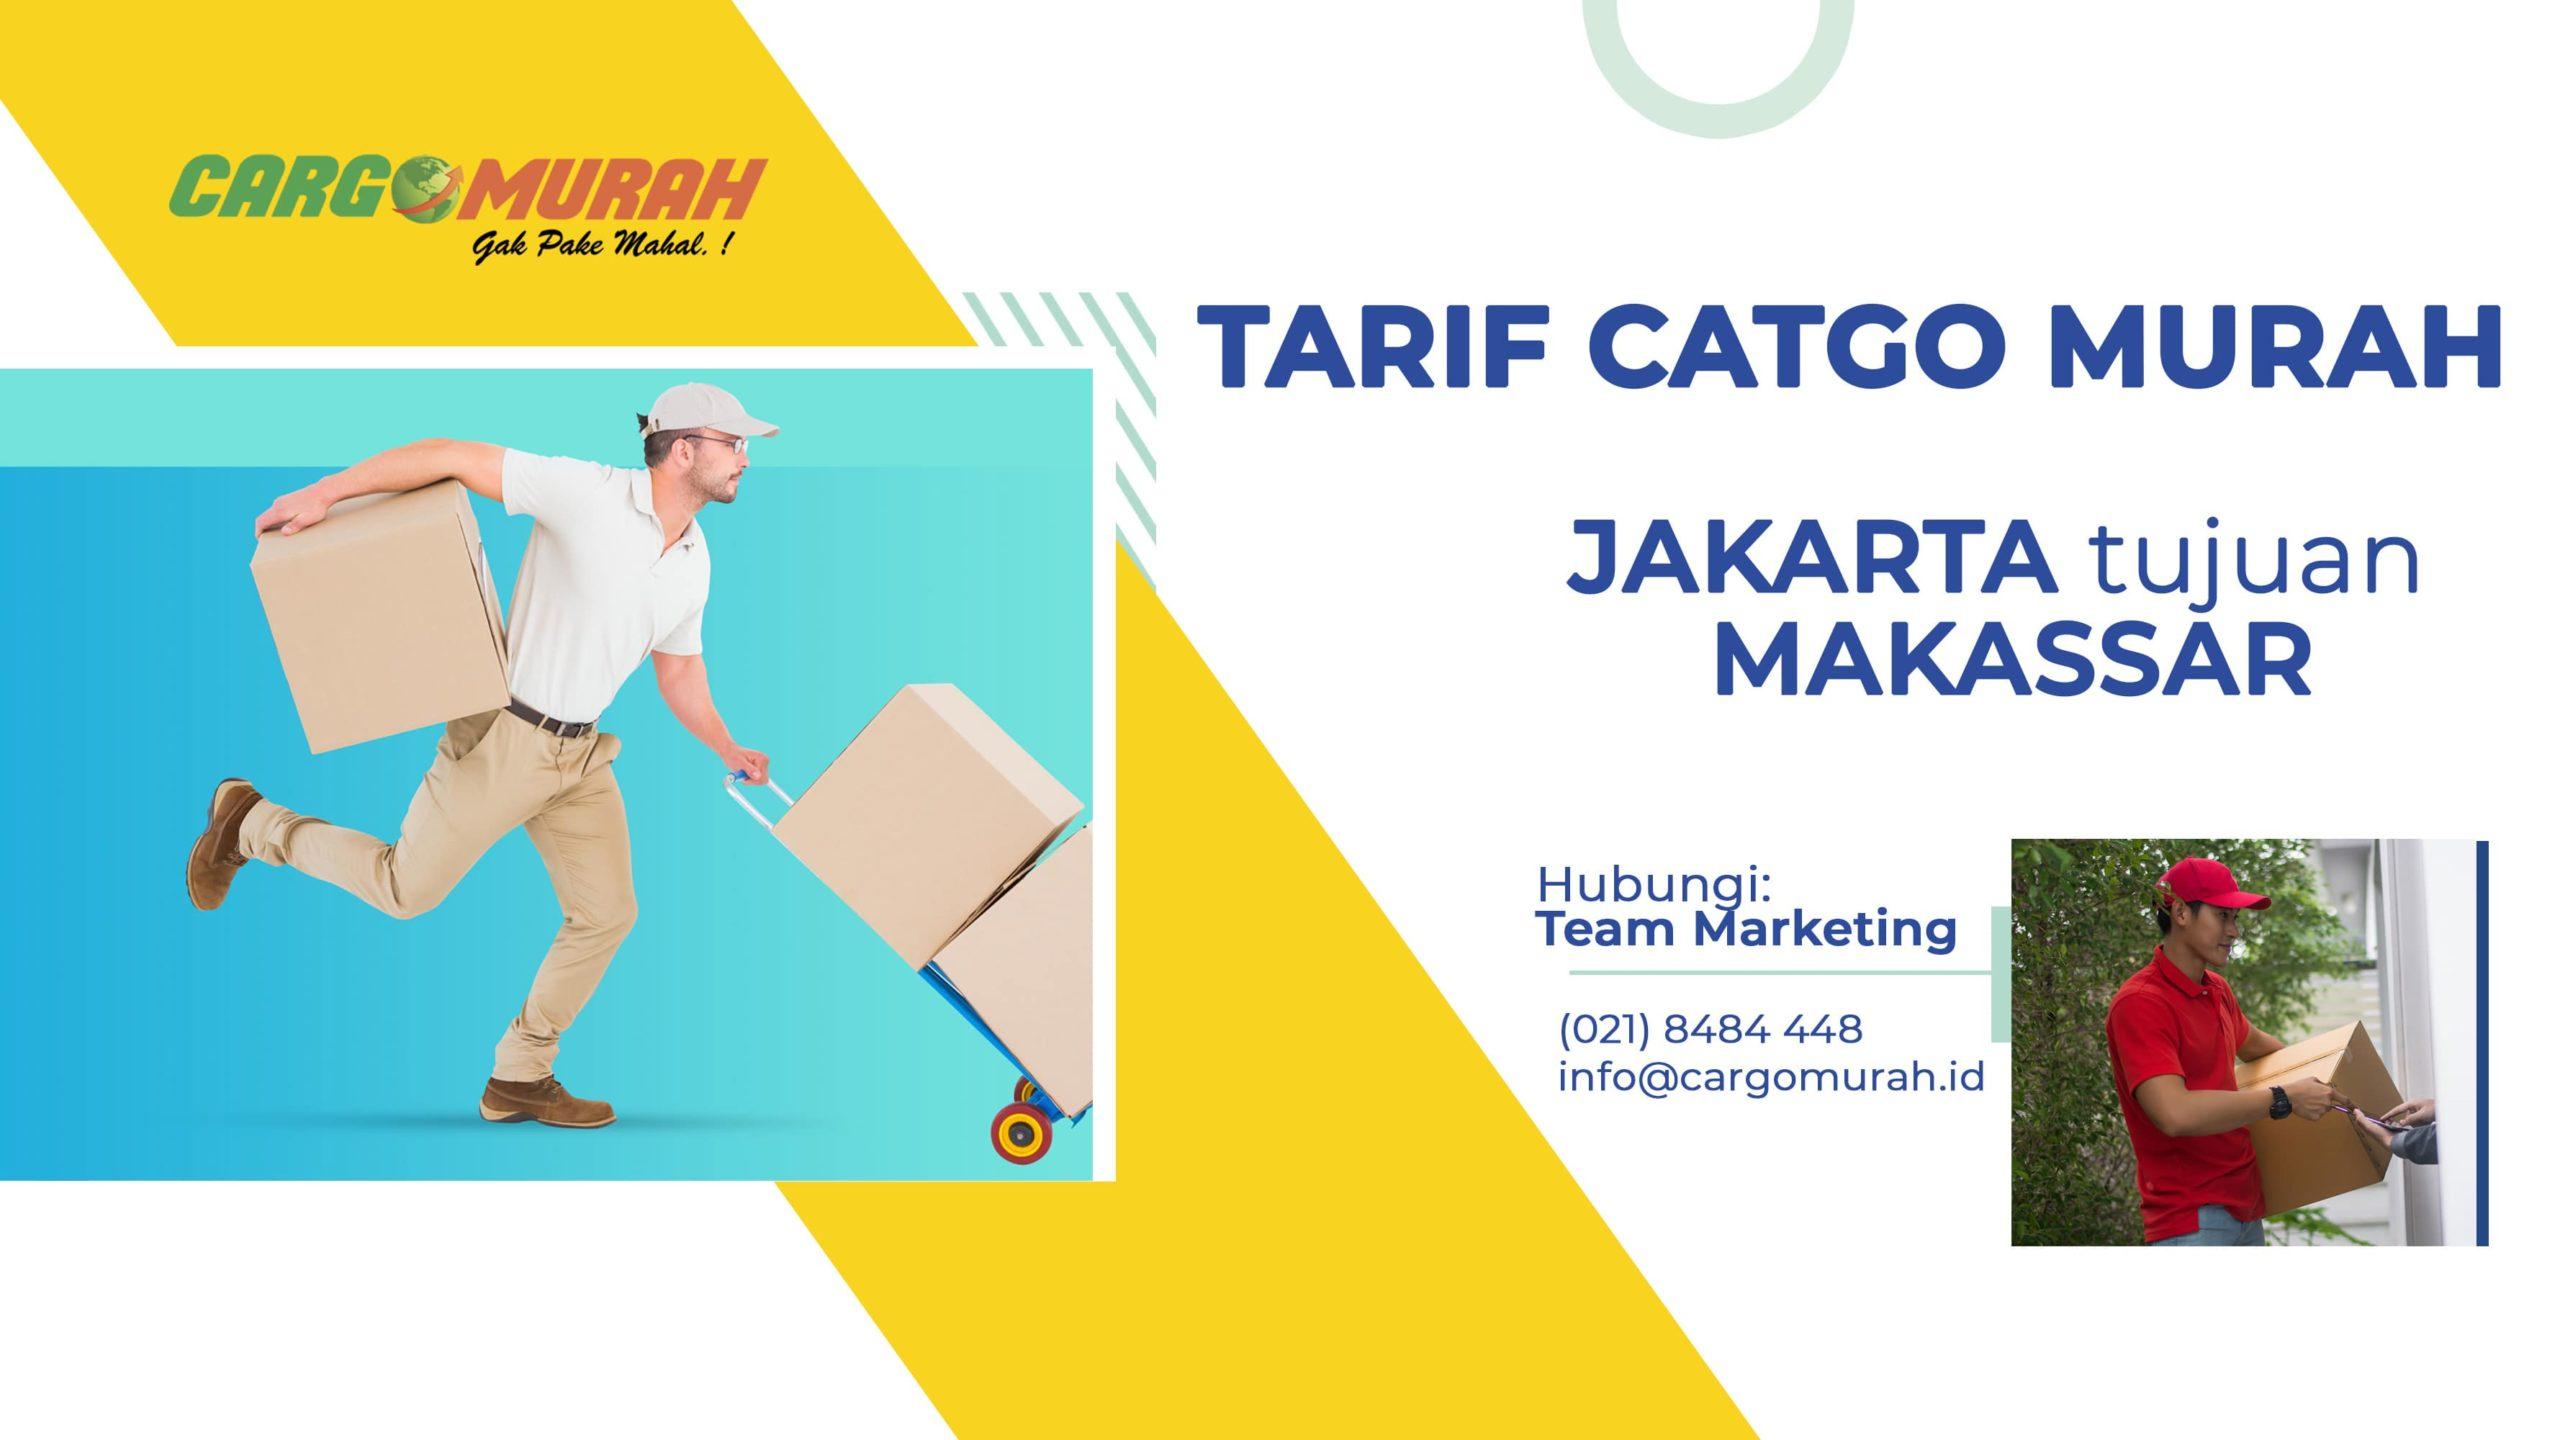 Jasa Cargo Murah Jakarta ke Makassar Sulawesi Selatan